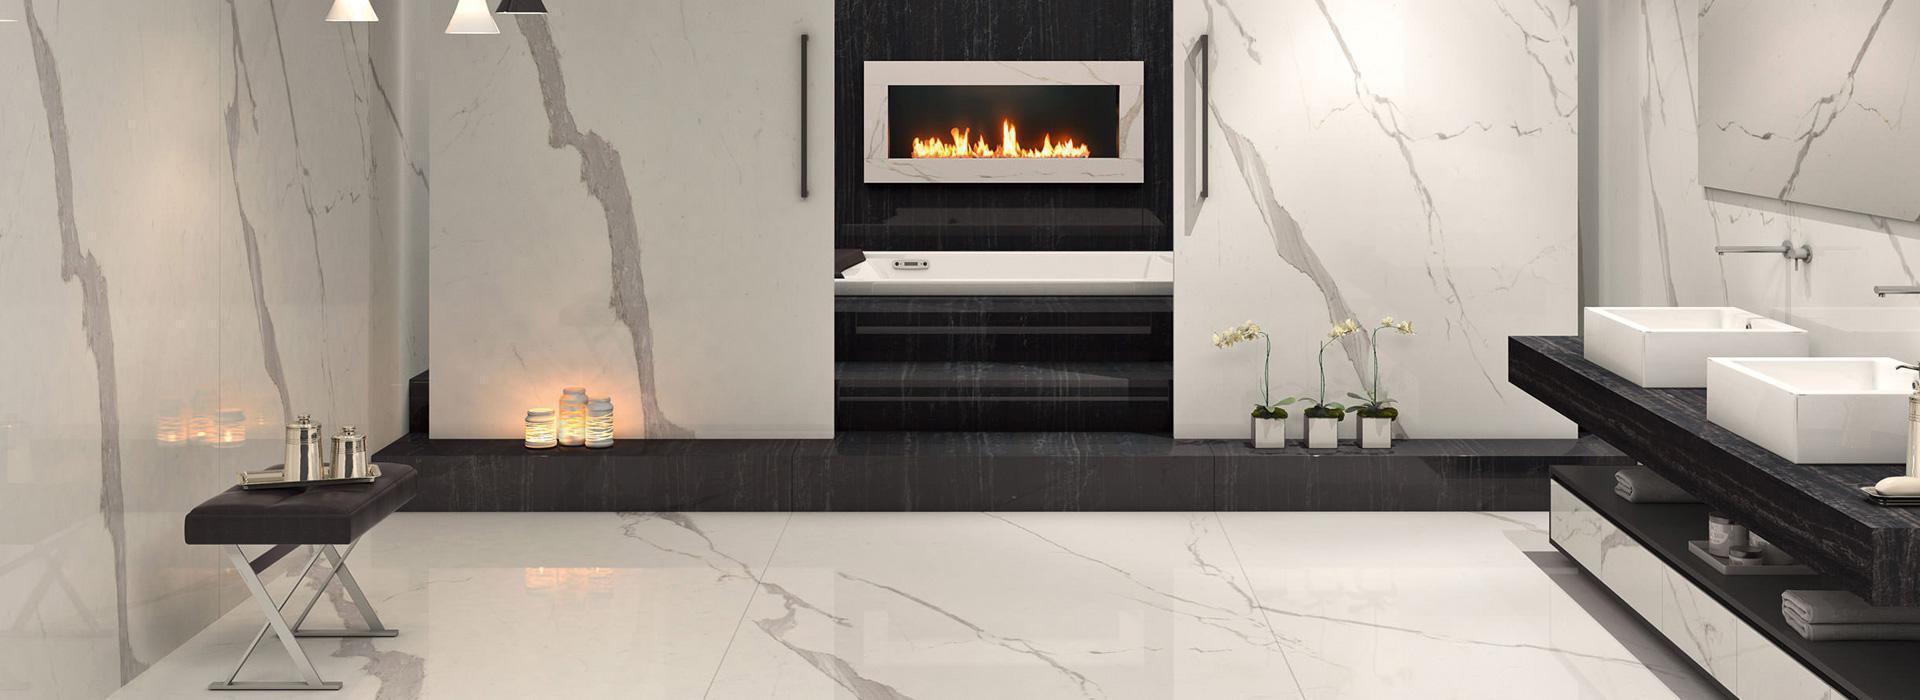 feinsteinzeug in marmoroptik fmg fabbrica marmi e graniti. Black Bedroom Furniture Sets. Home Design Ideas